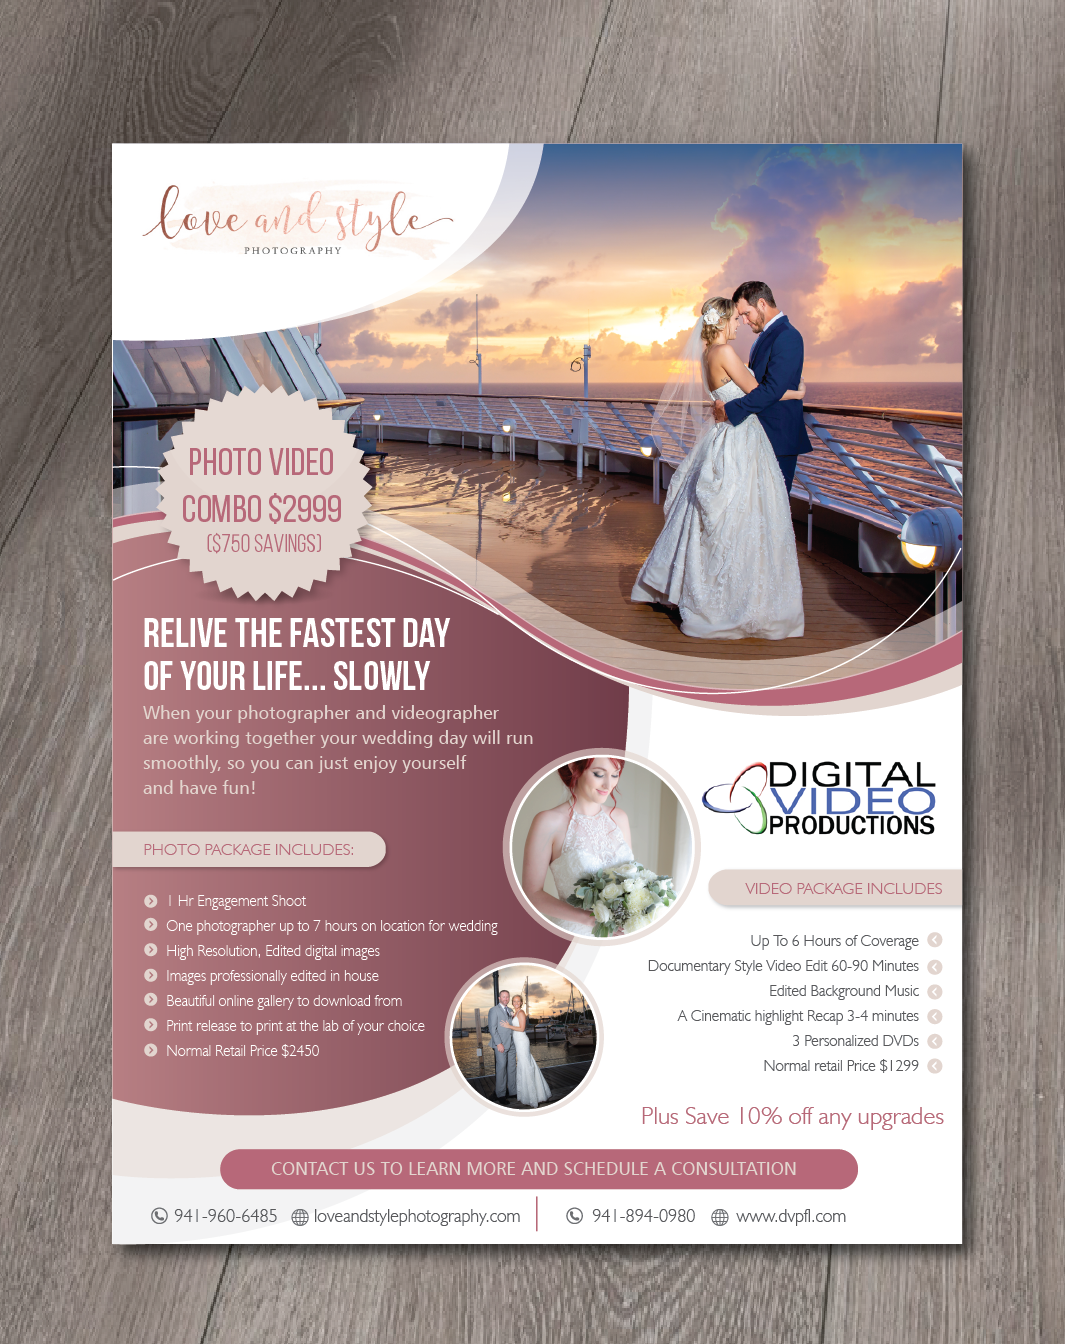 Feminine Elegant Wedding Photography Flyer Design For Dvp Llc By Alex989 Design 21219920